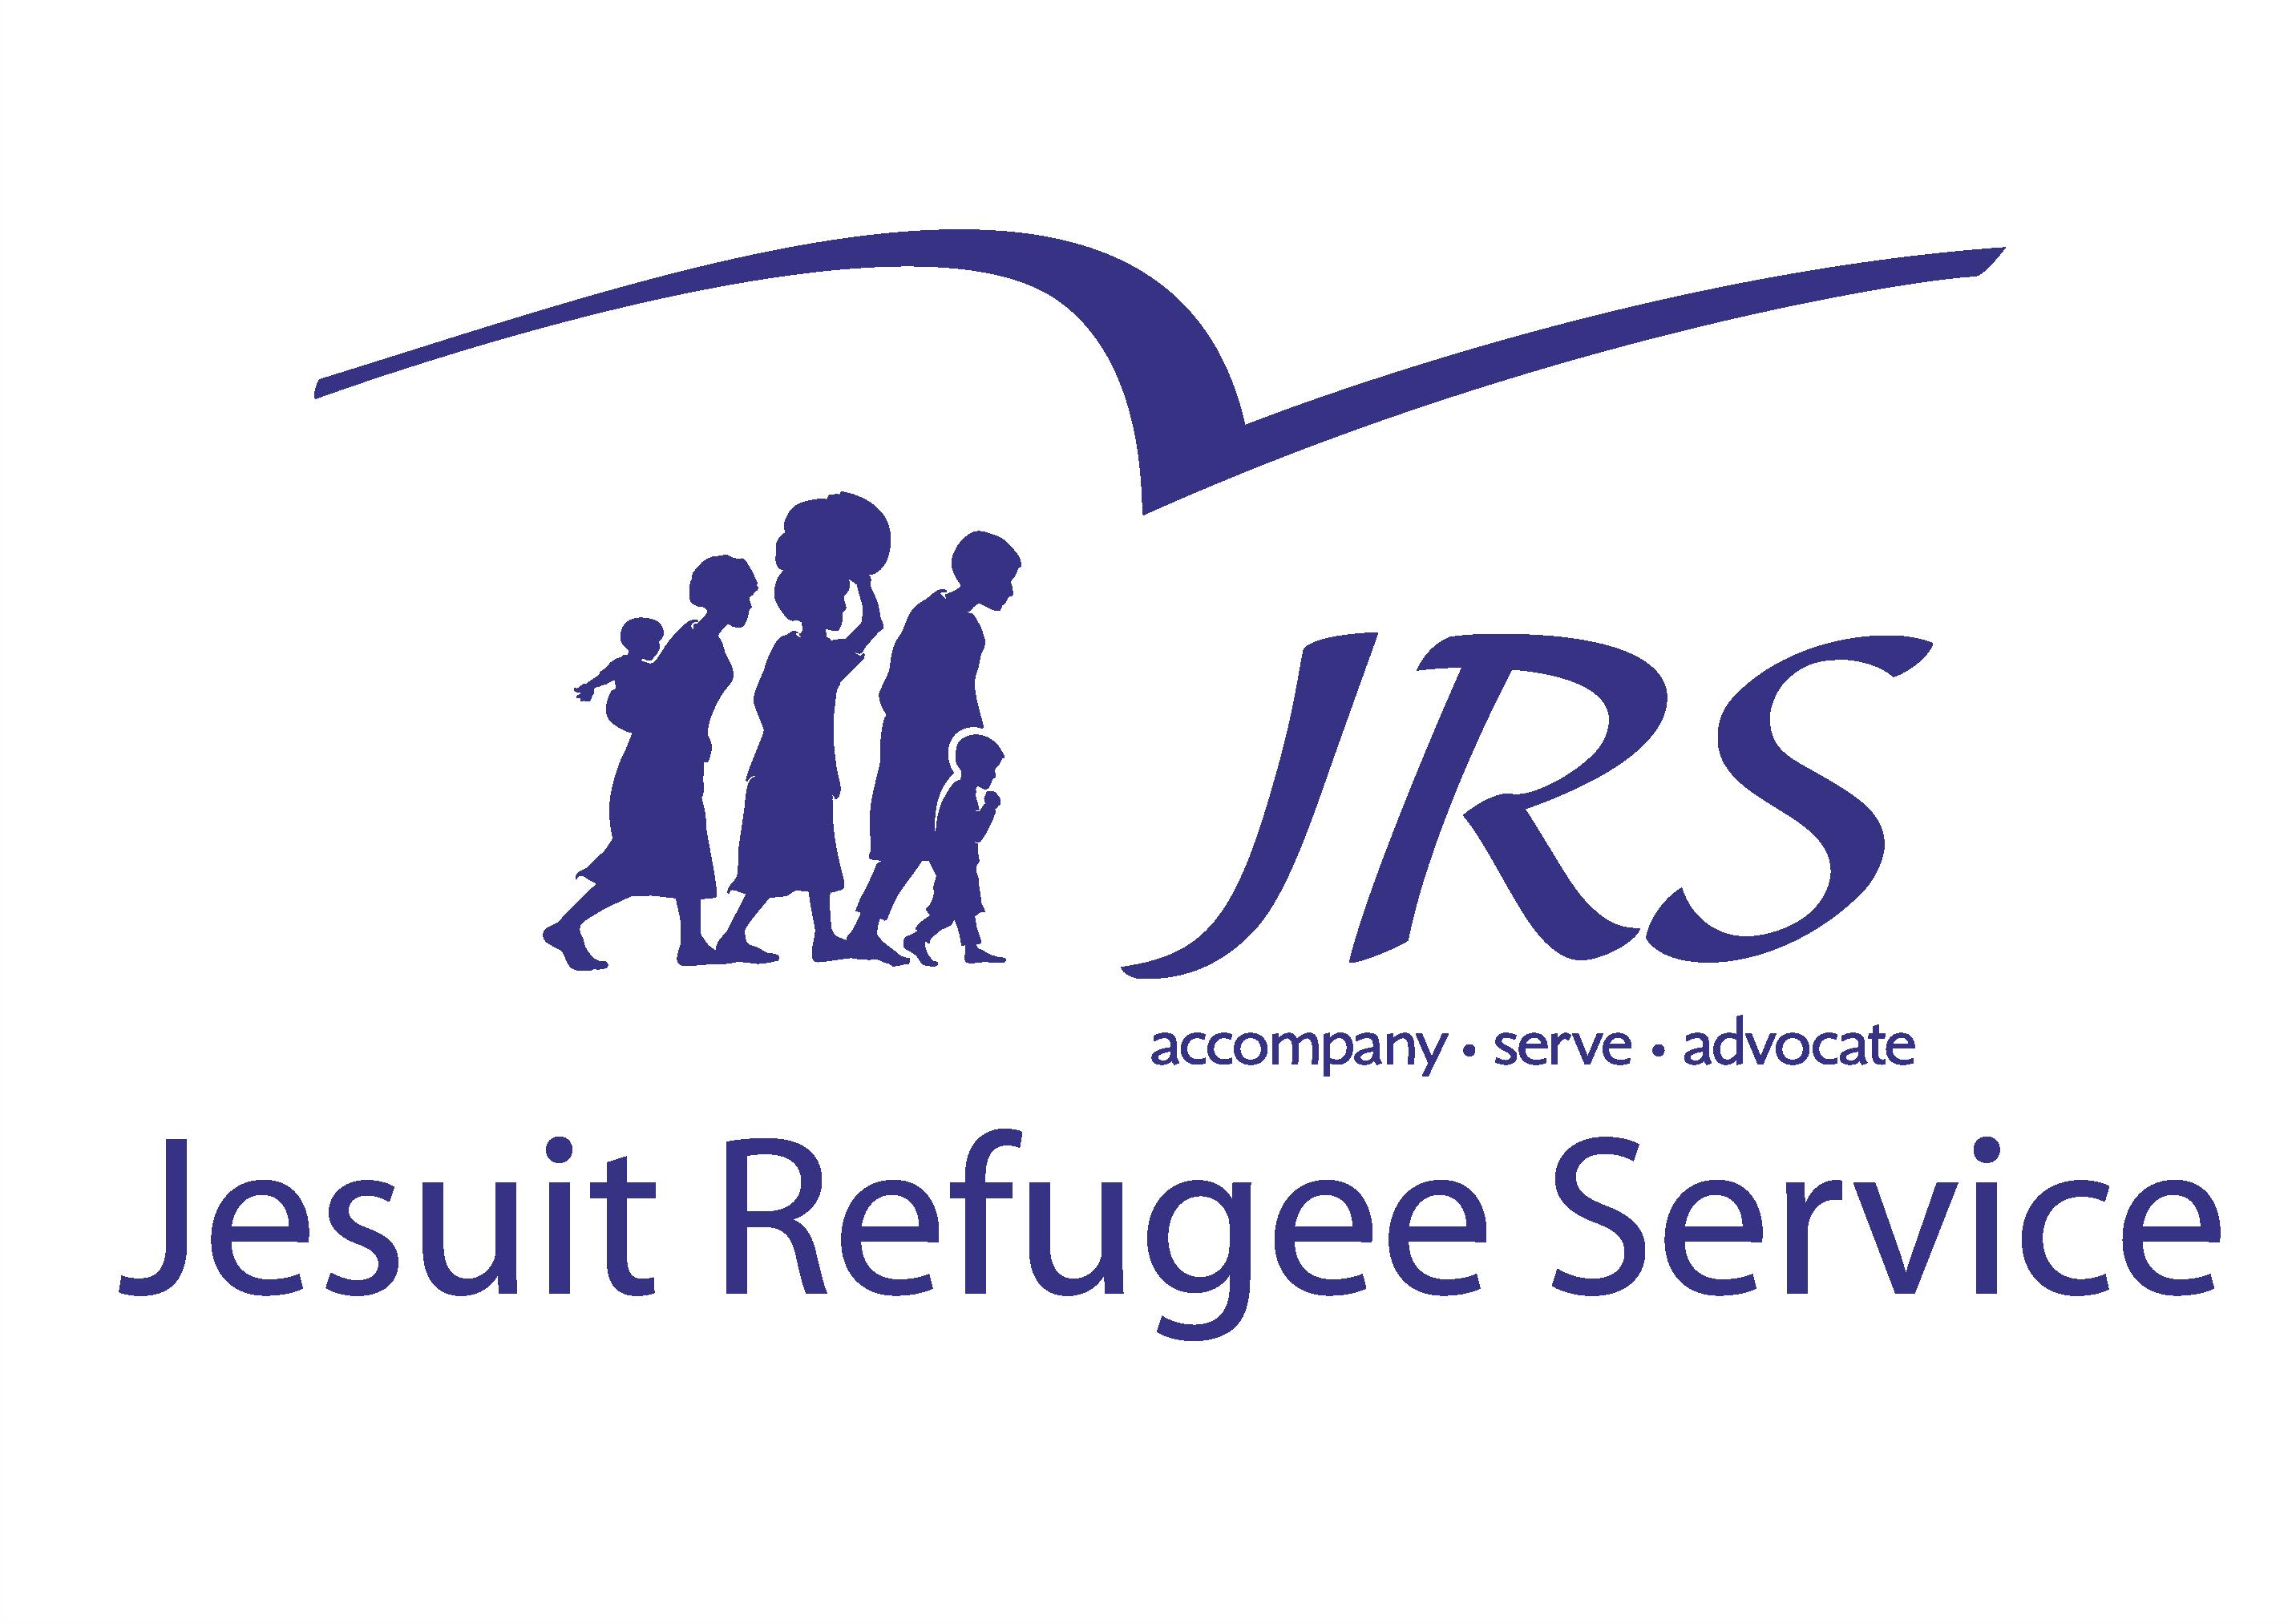 Jesuit Refugee Service - JRS